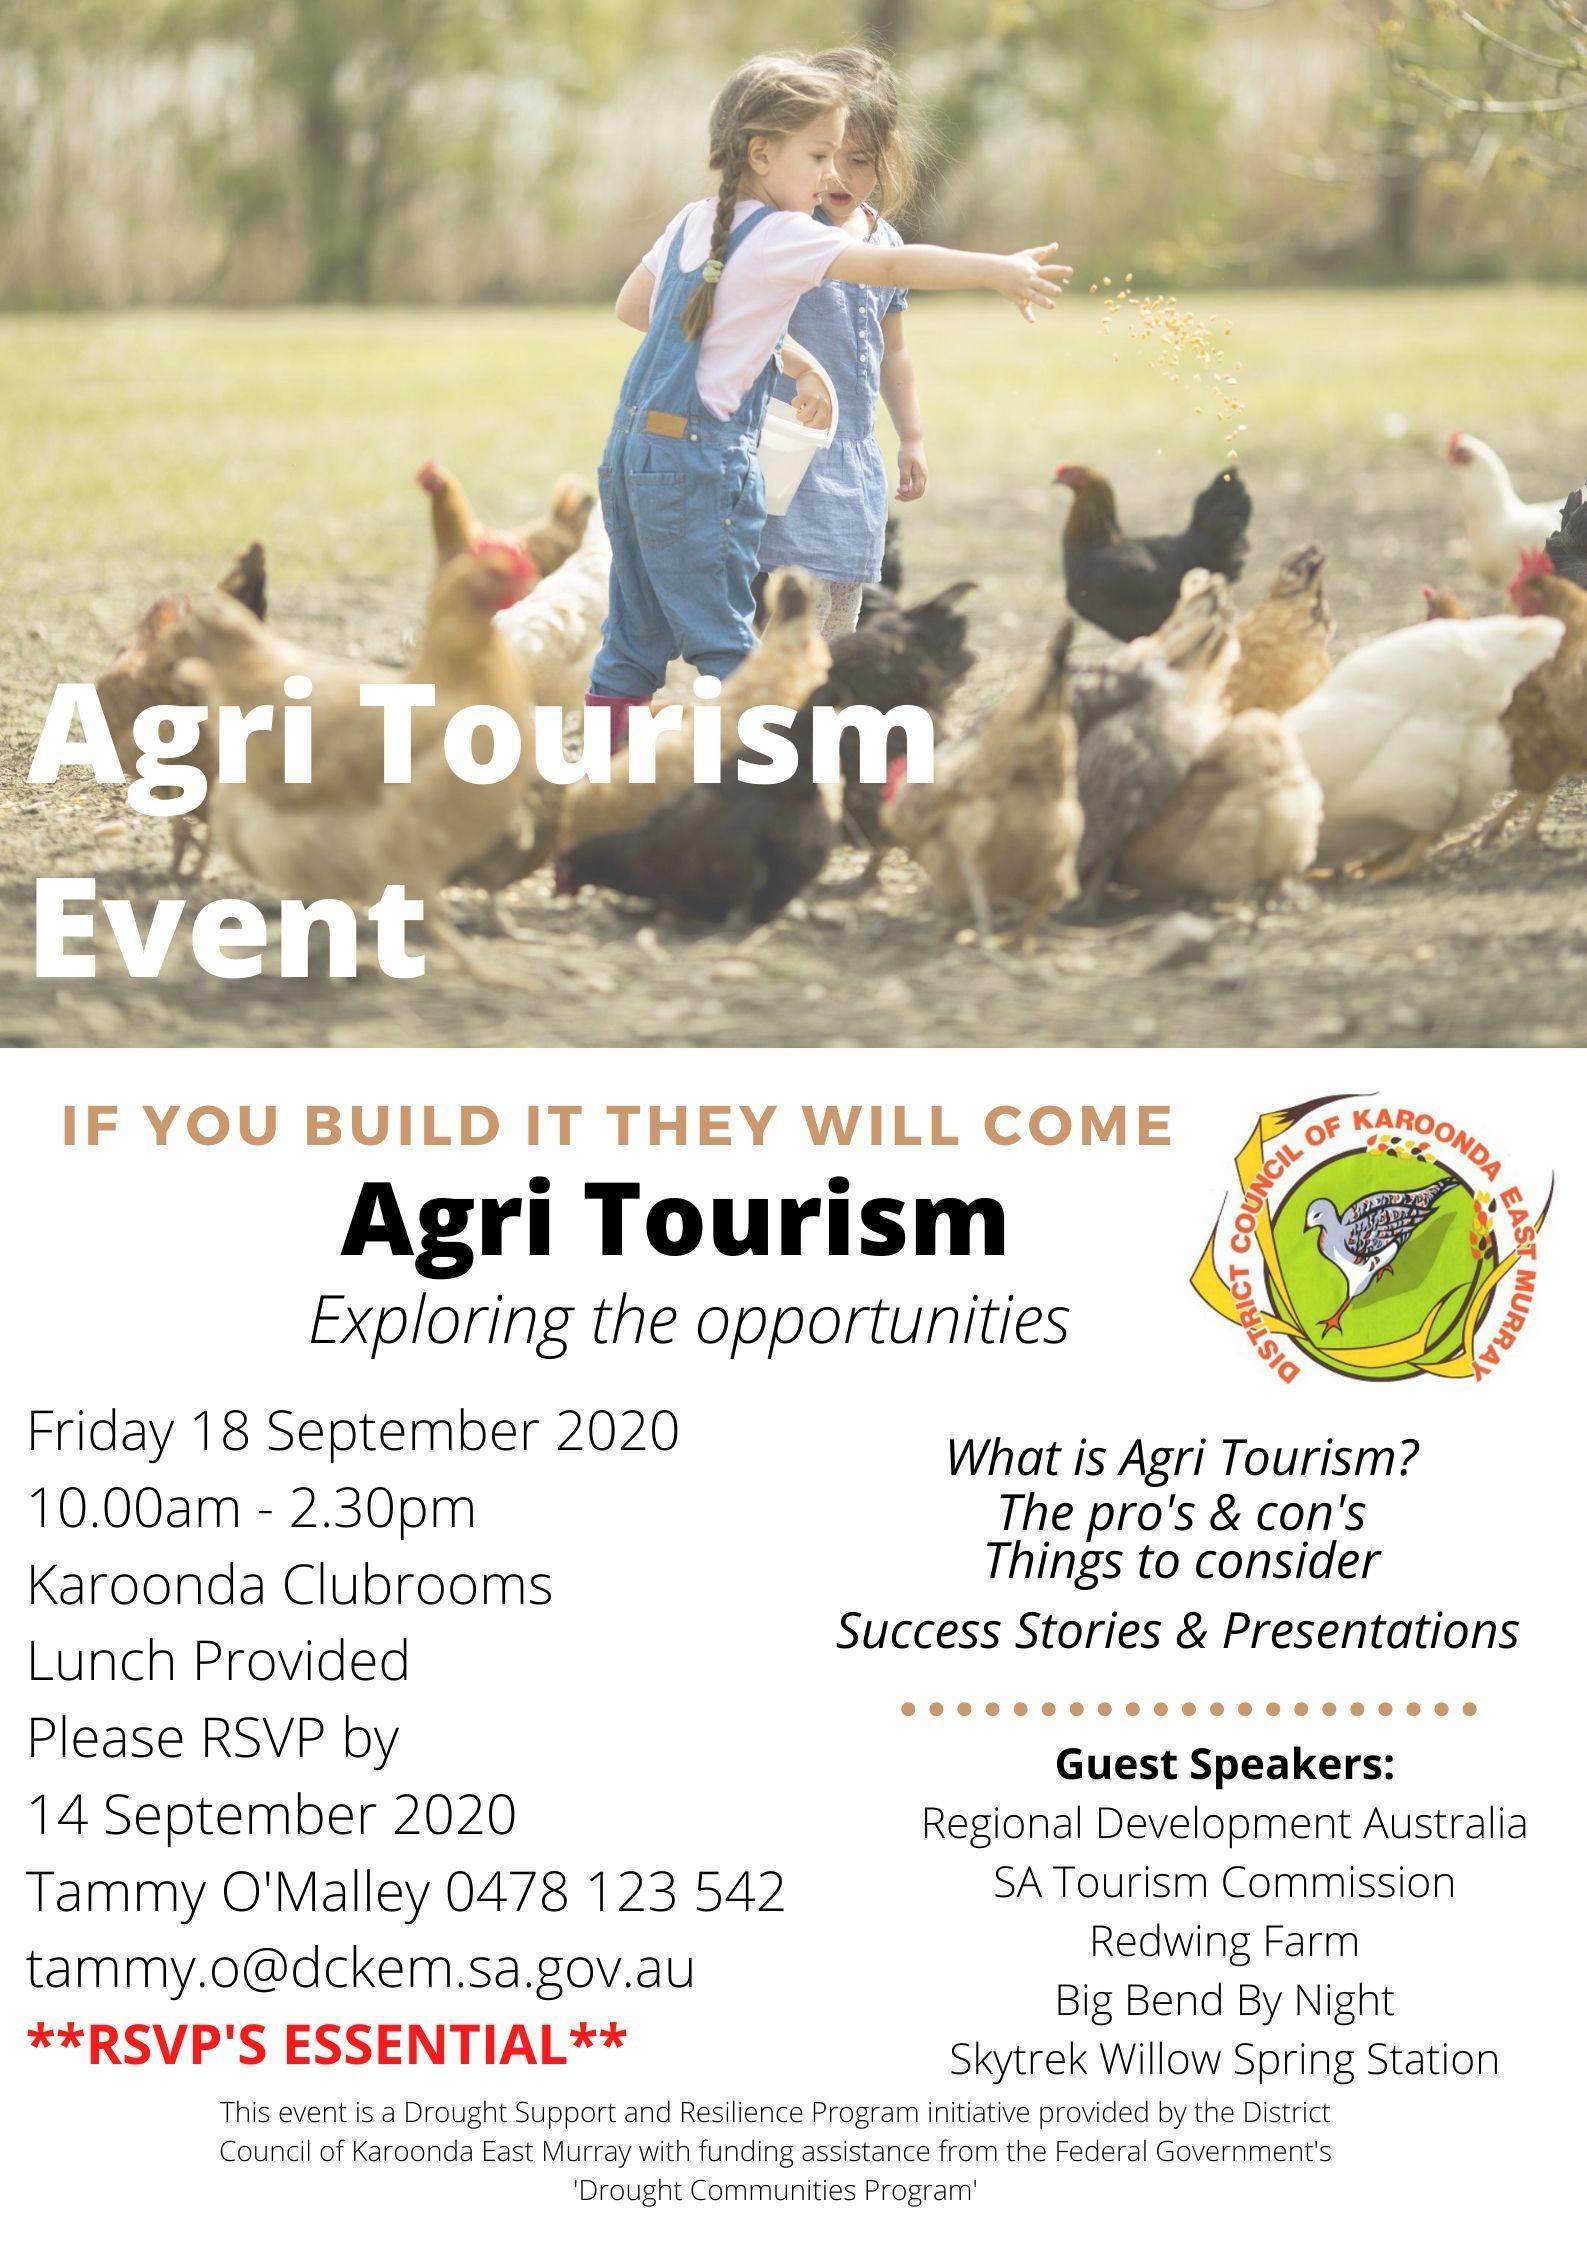 Agri Tourism Event